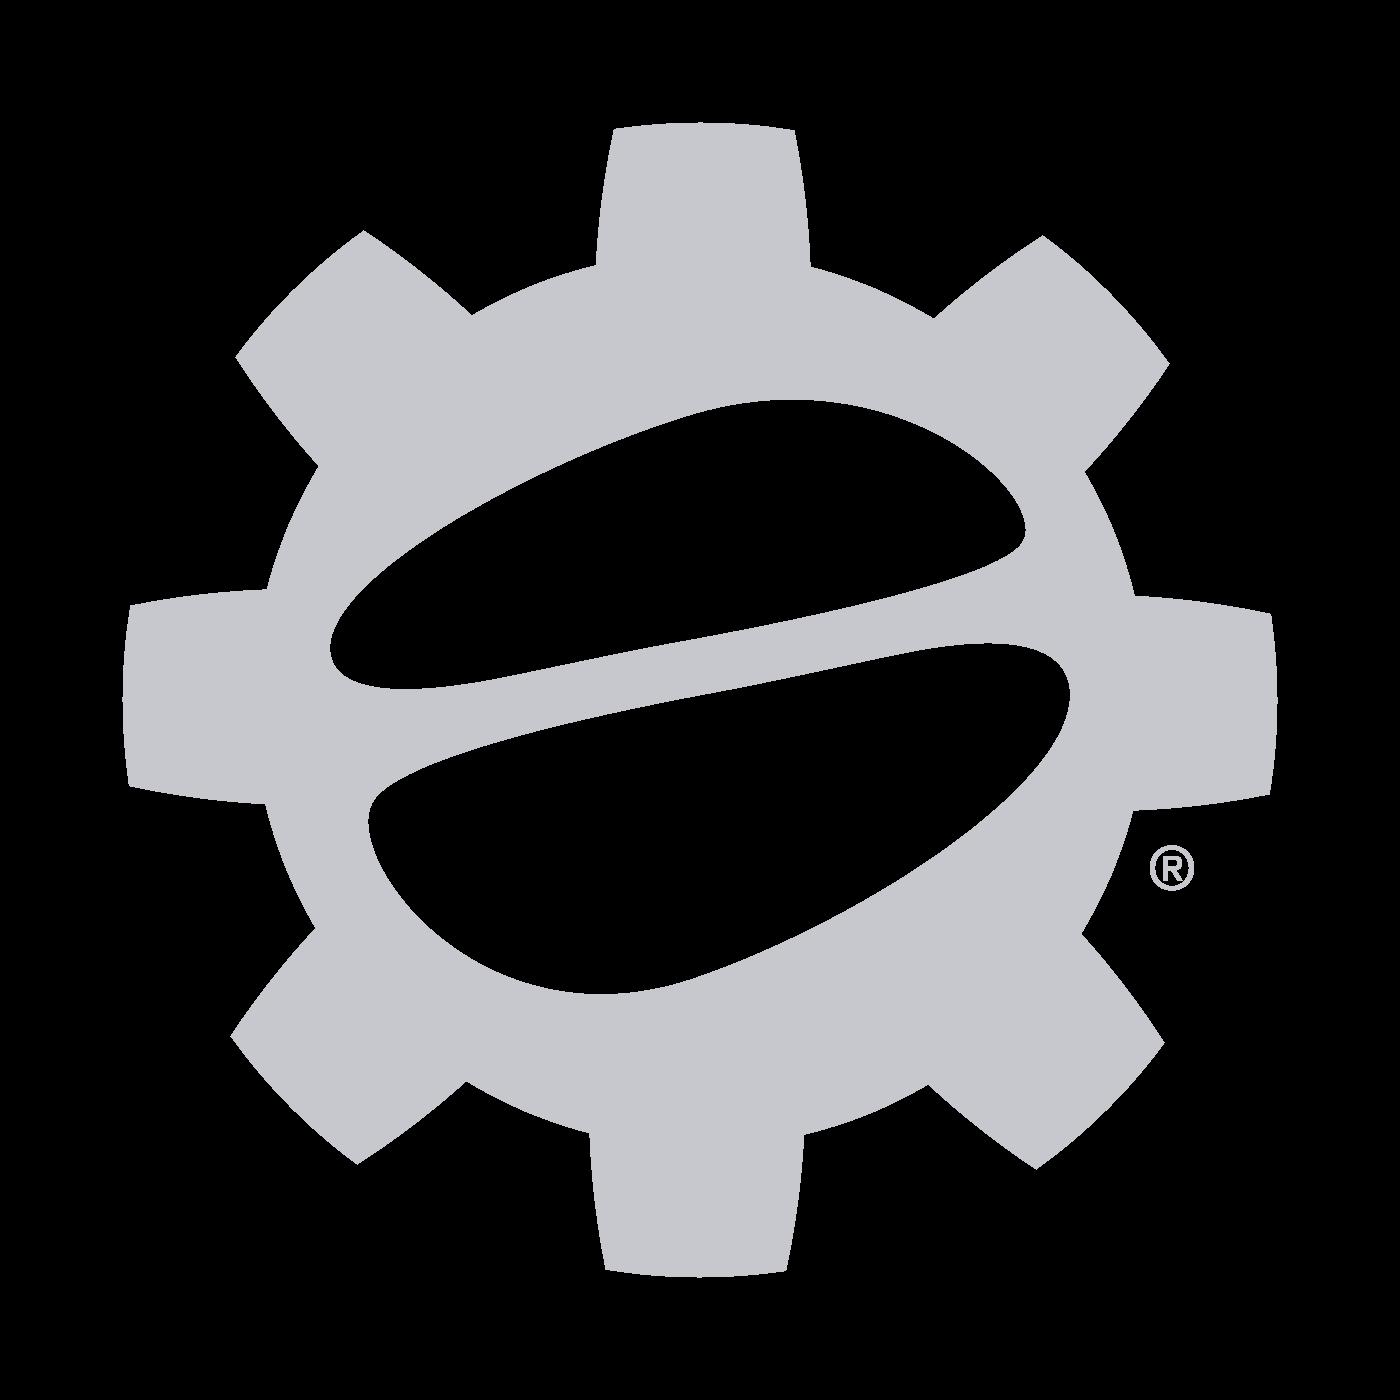 Philips 3200 Superautomatic Espresso Machine - Front